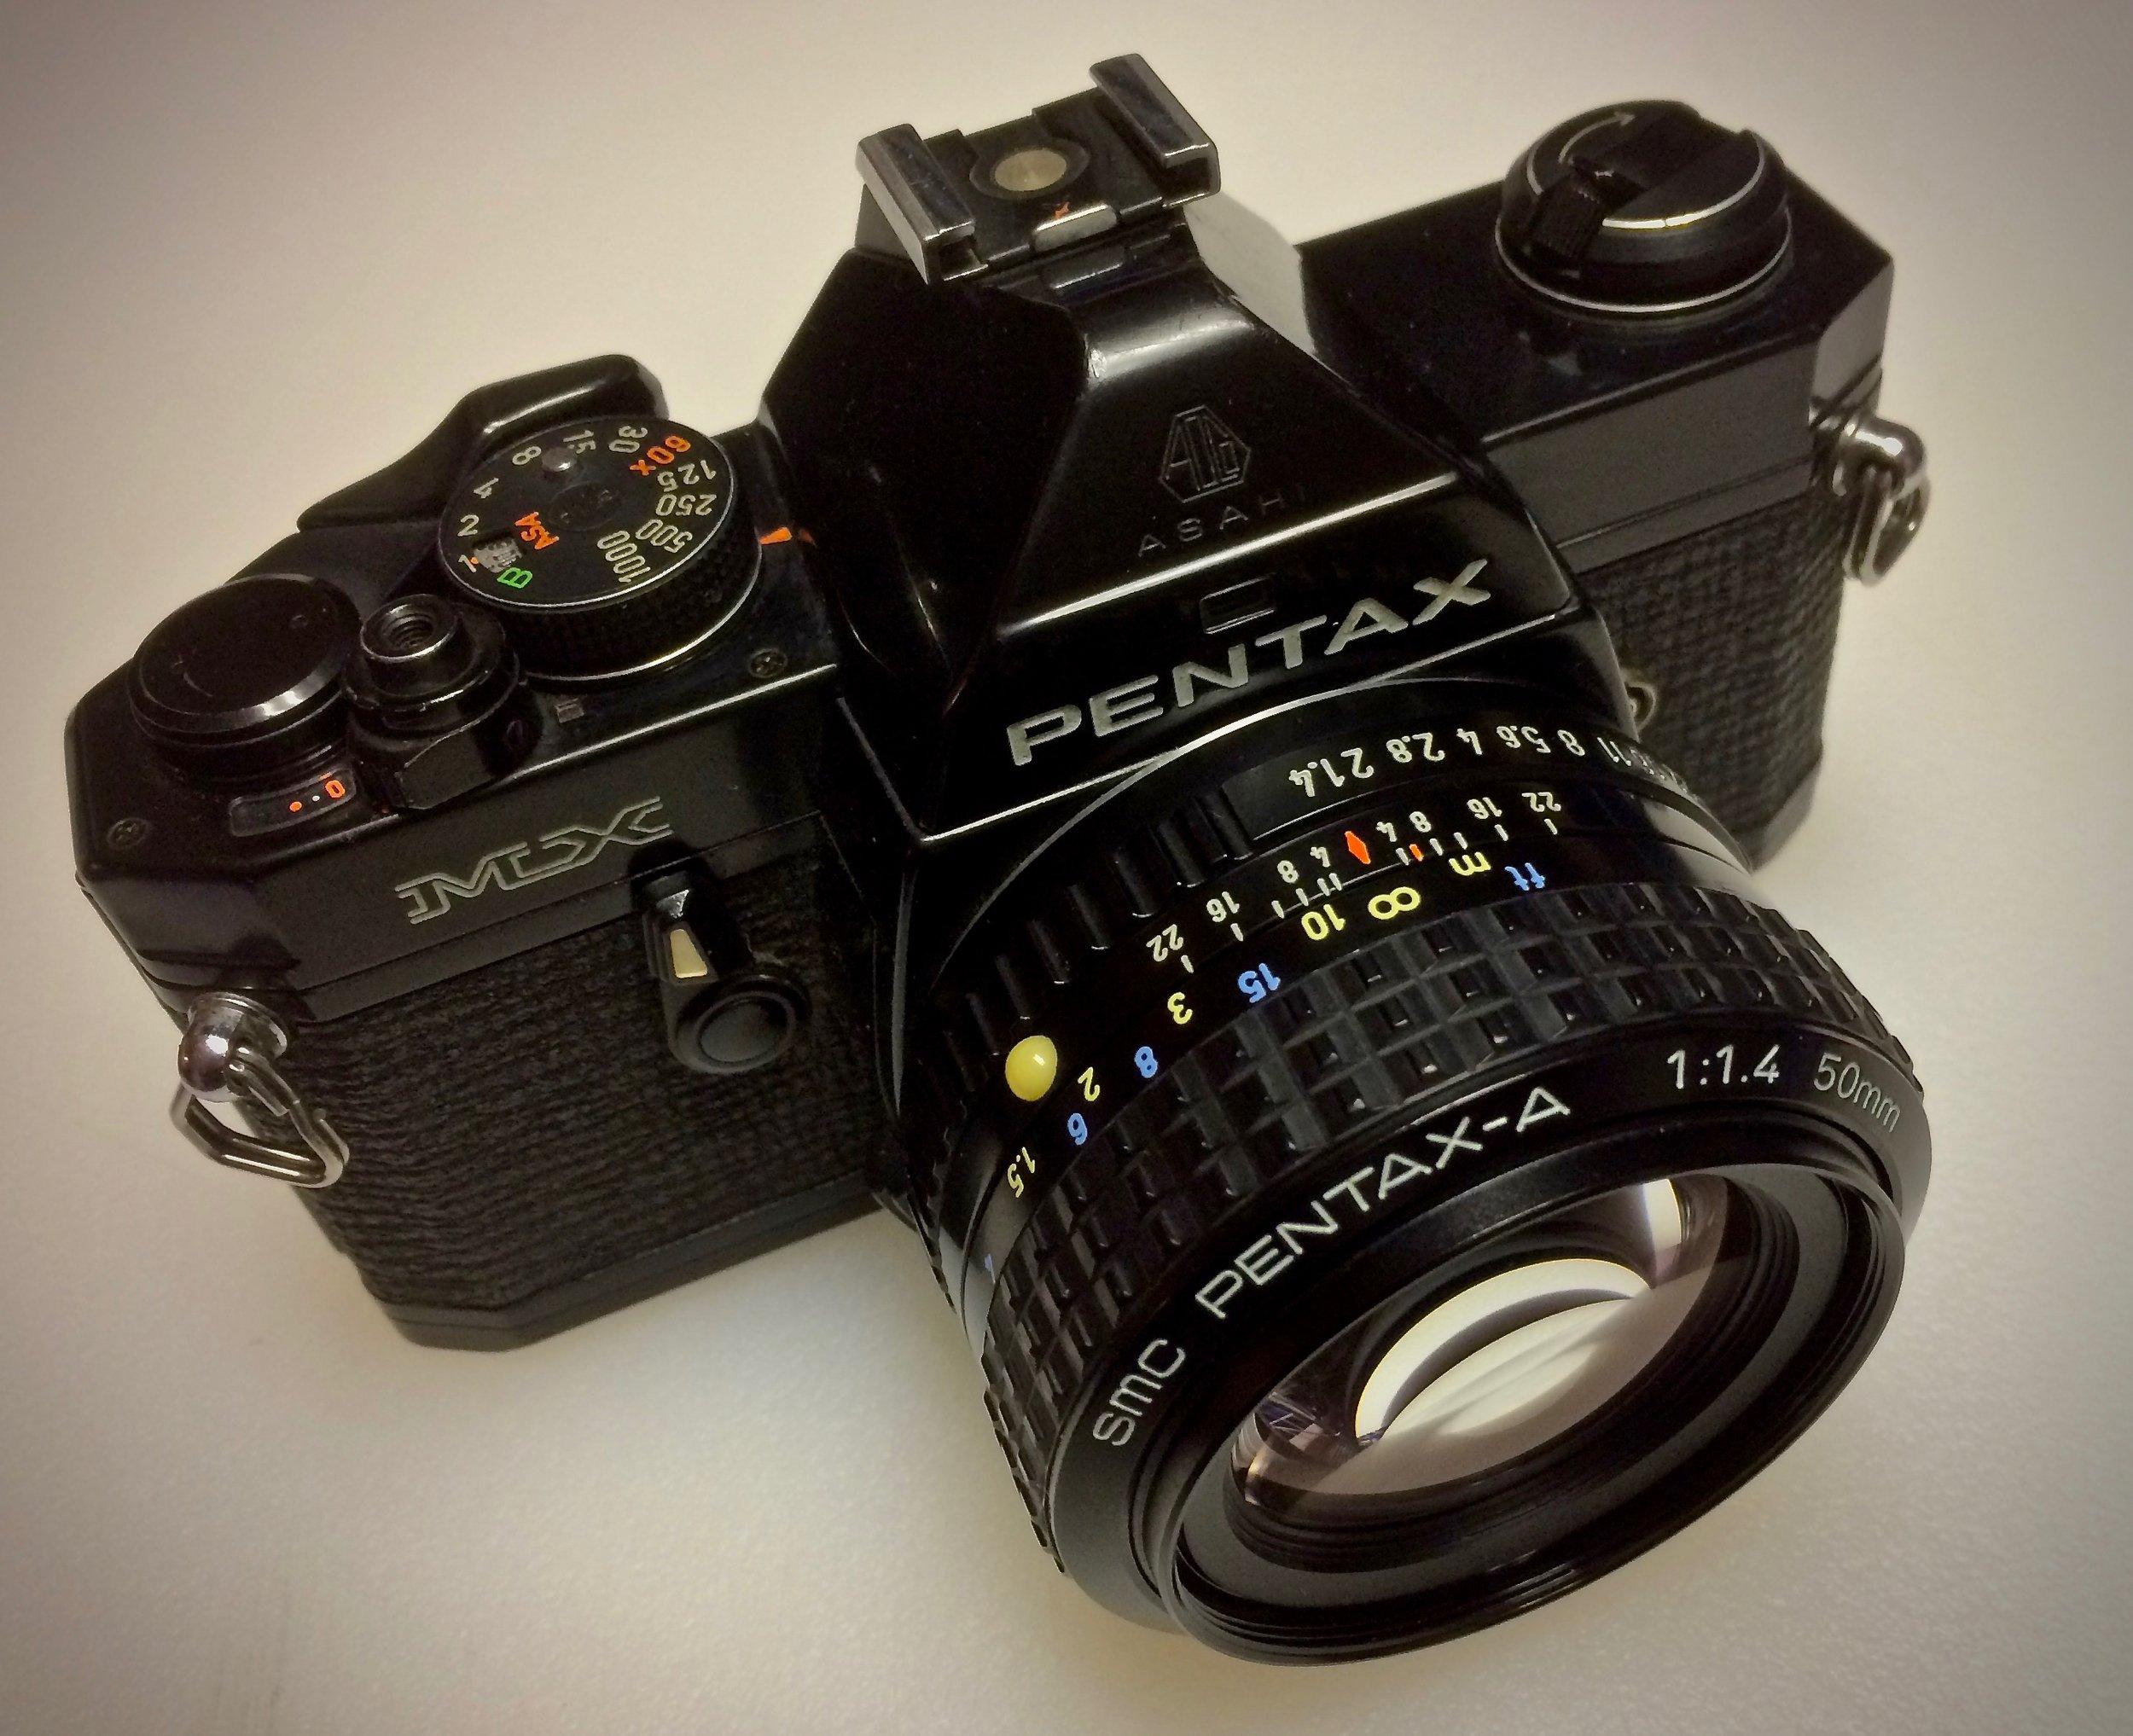 Pentax MX 35mm SLR with SMC Pentax-A 50mm f/1.4 lens